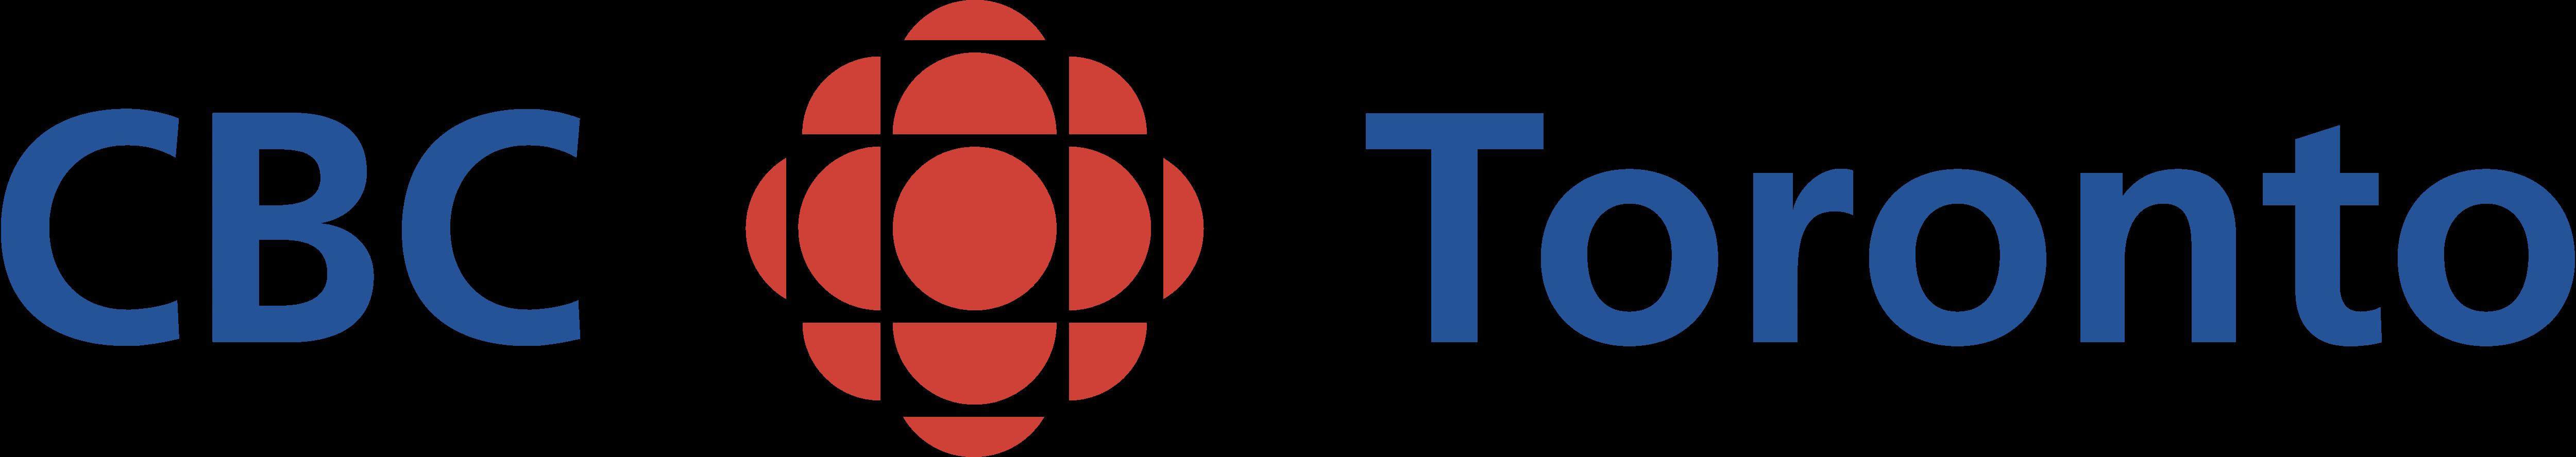 Download CBC News 4.1.7 APK | 2019 Update